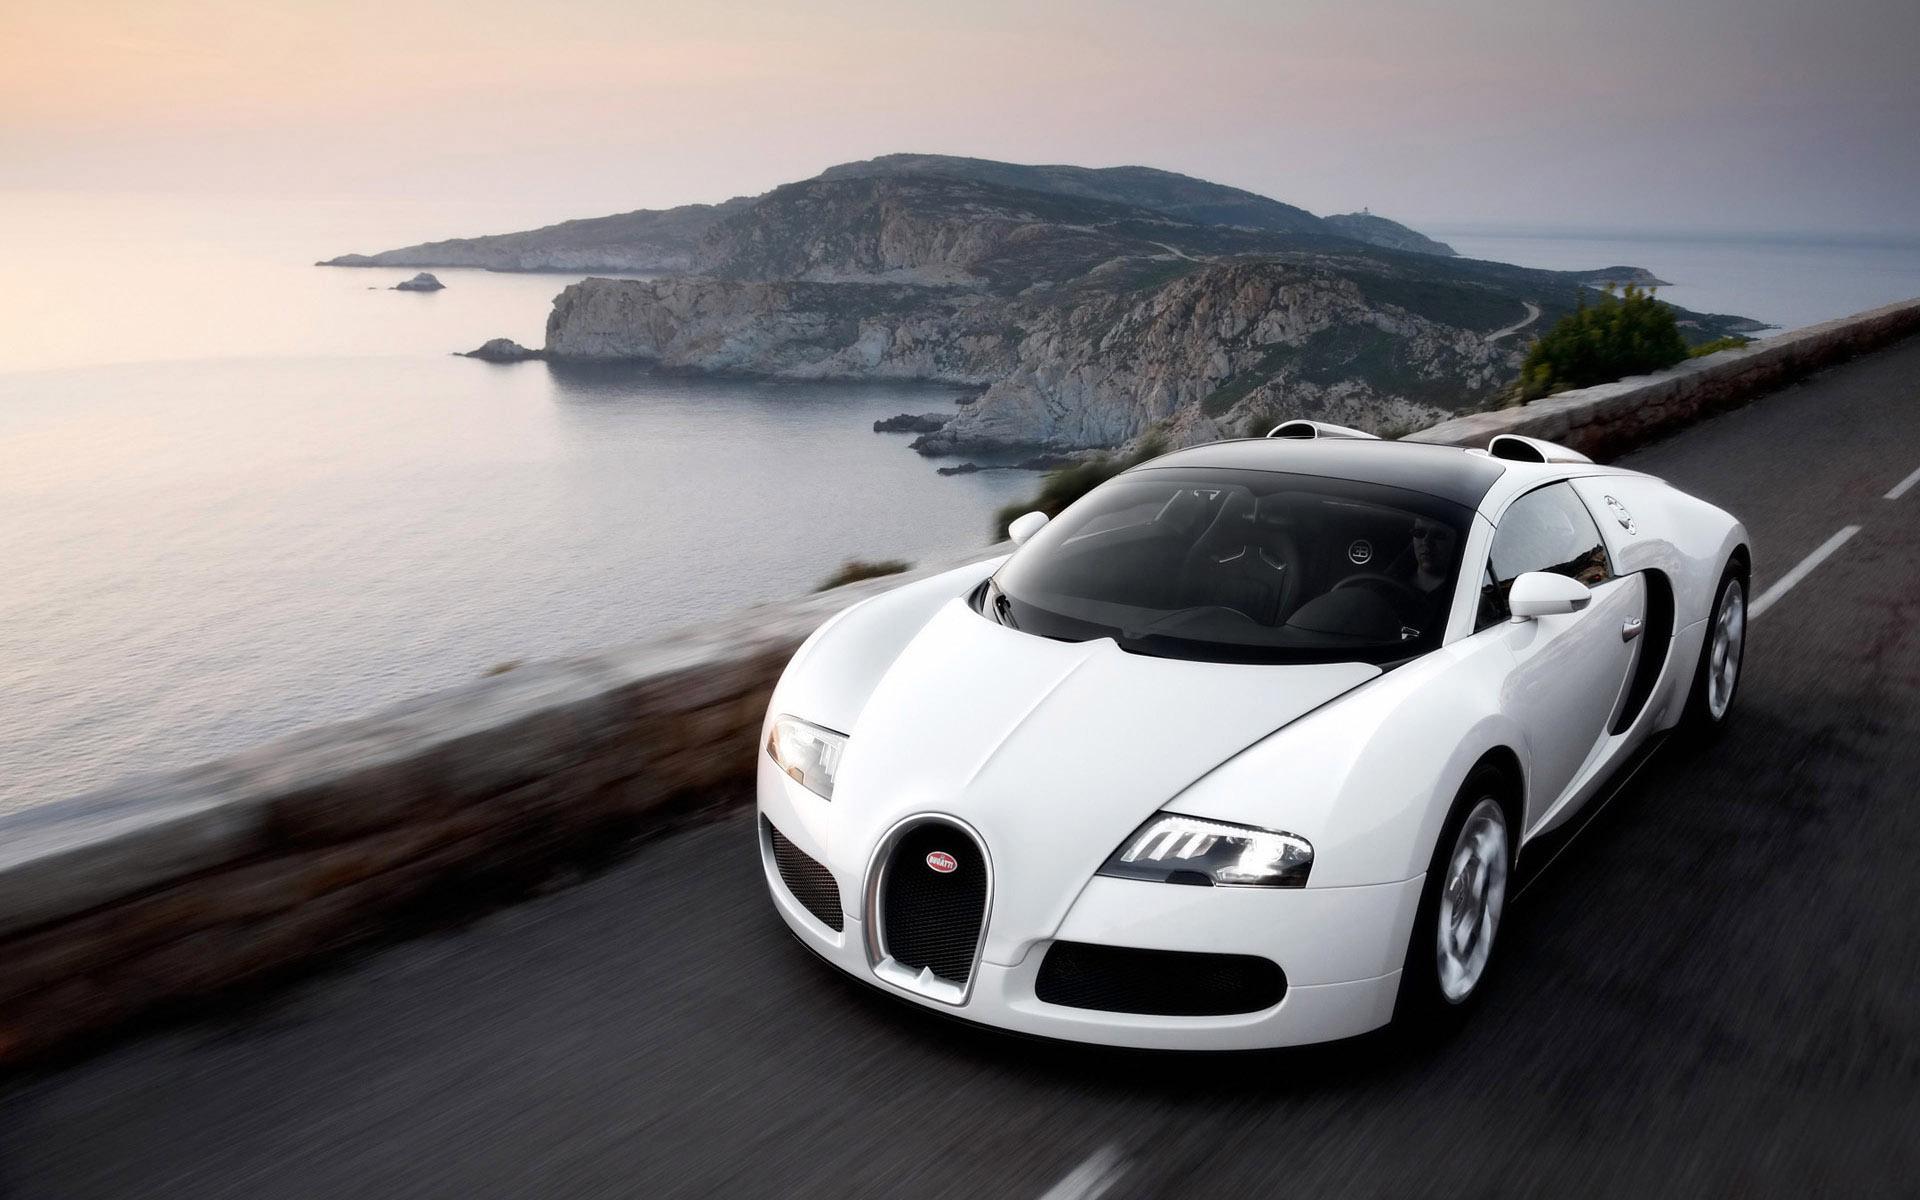 Bugatti Veyron Wallpaper 05